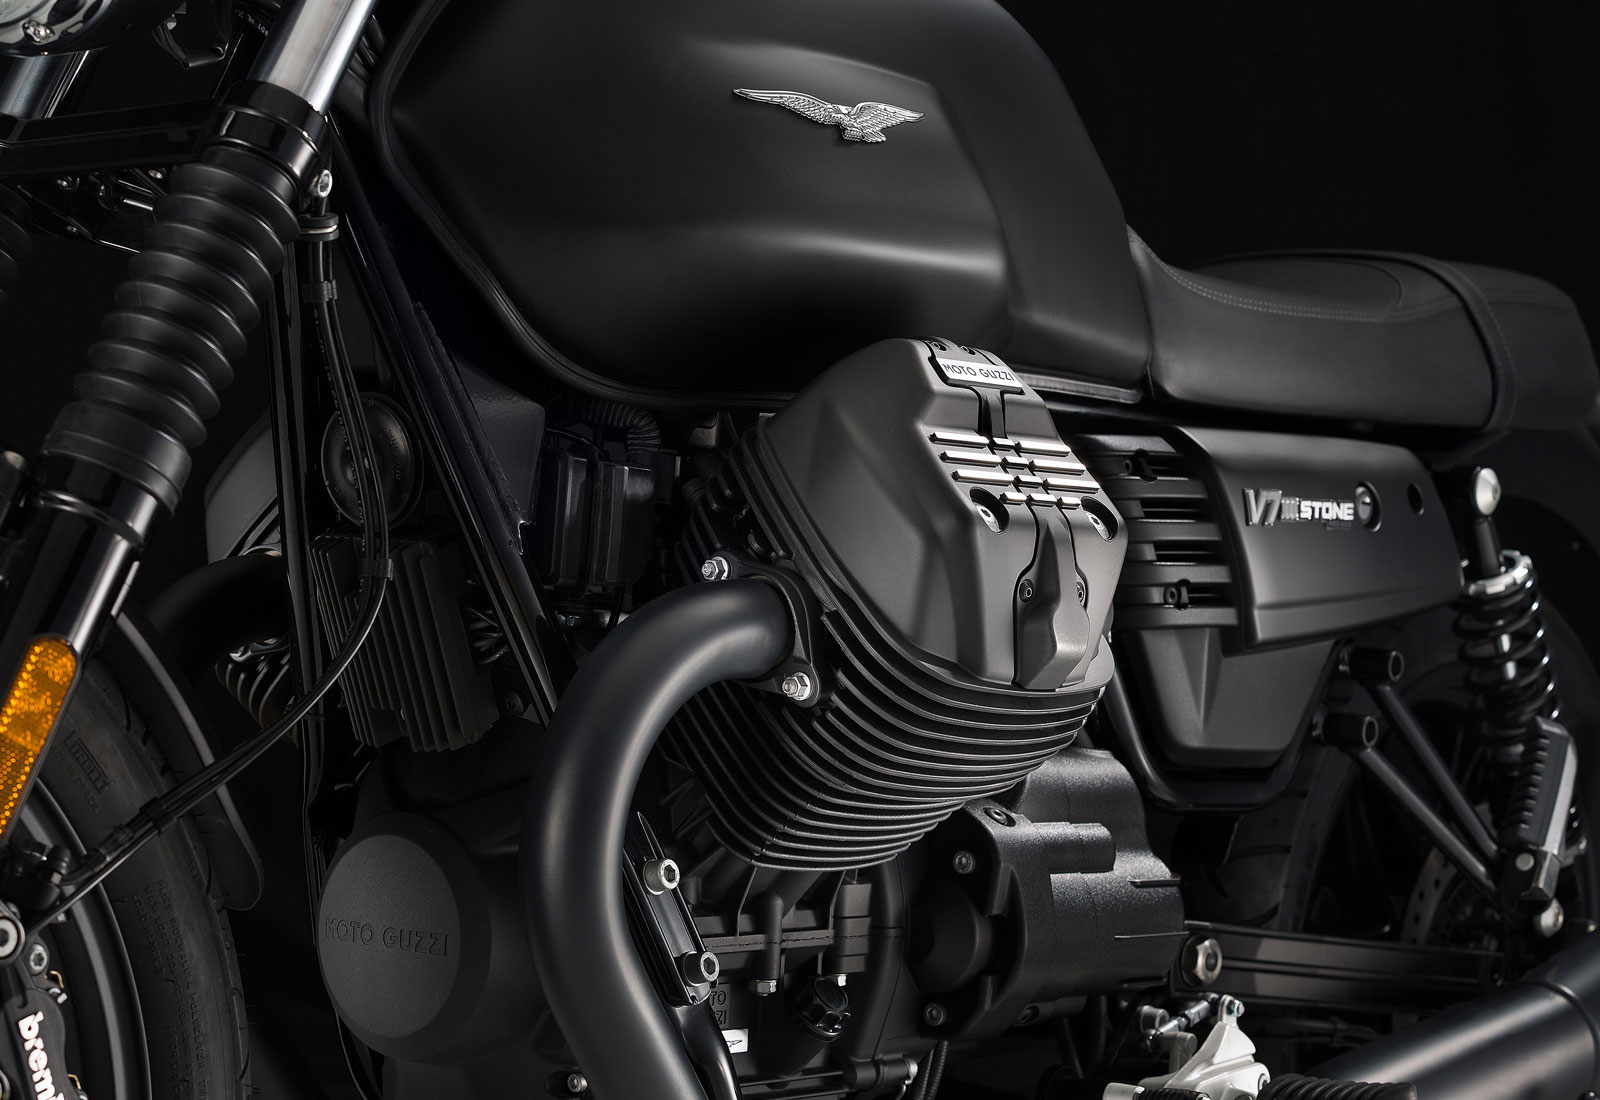 Moto modelo Stone, color negro. Marca Motoguzzi